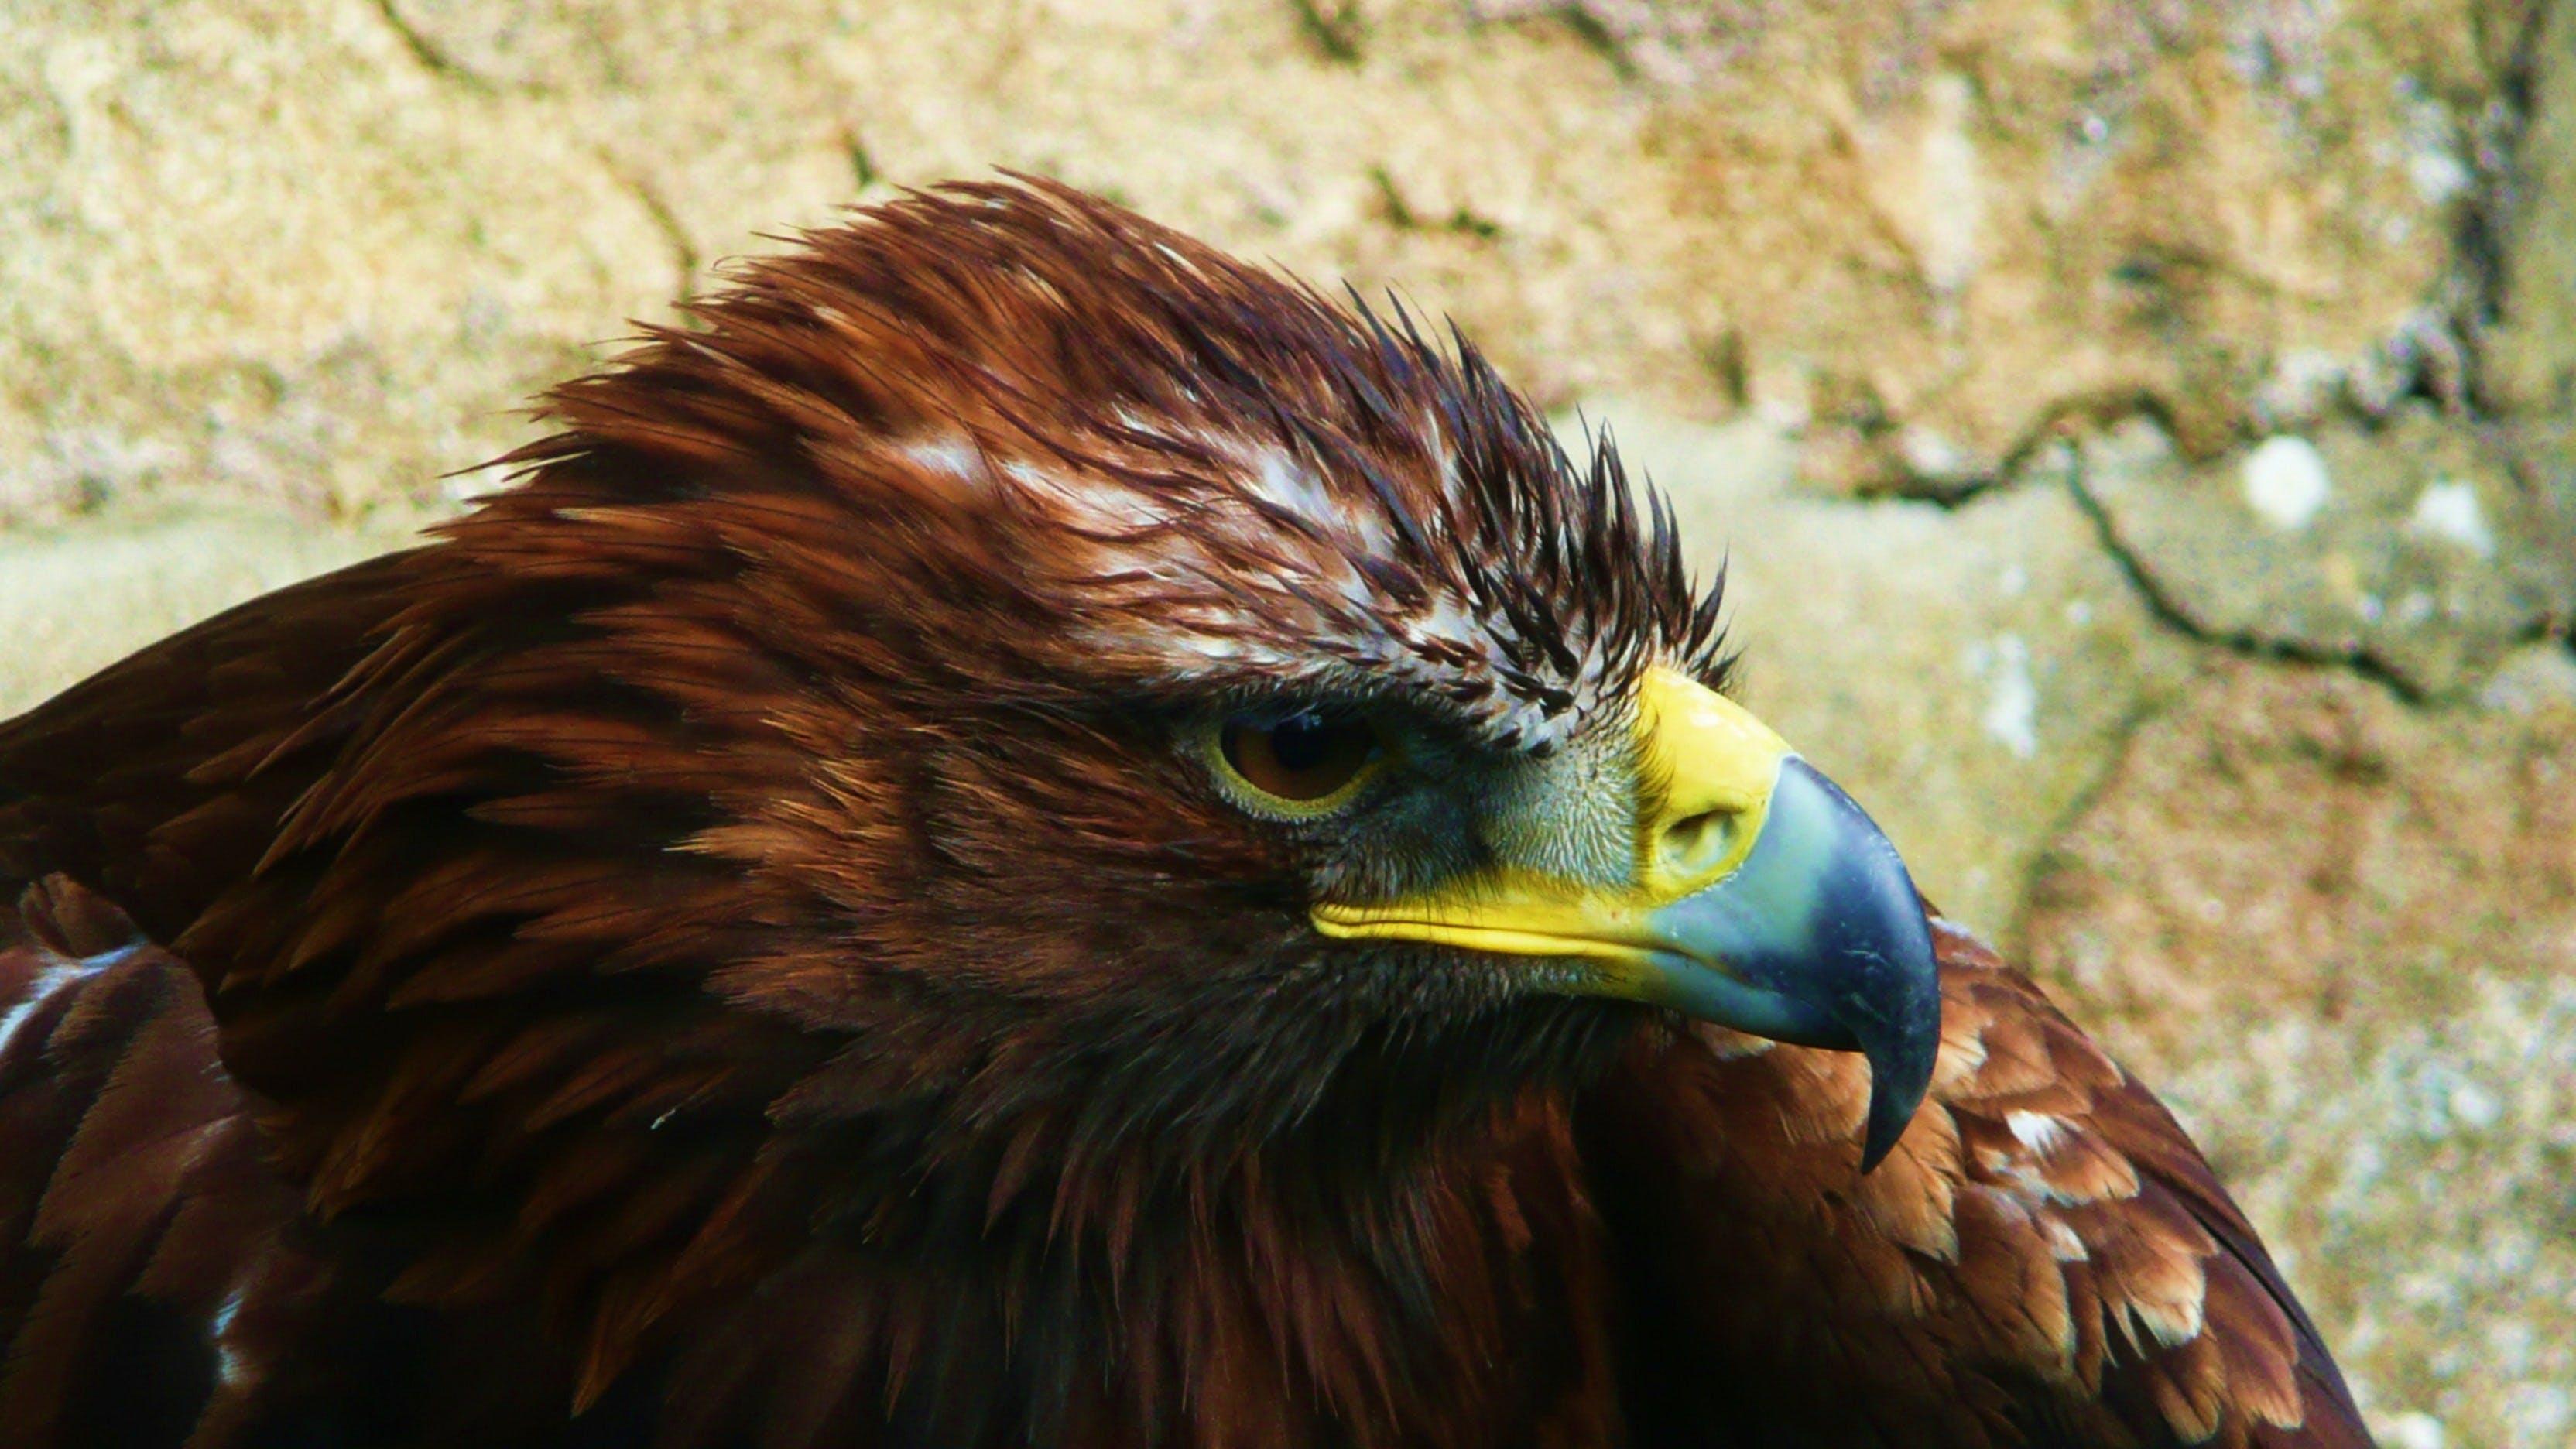 Free stock photo of bird, animal, eagle, predator